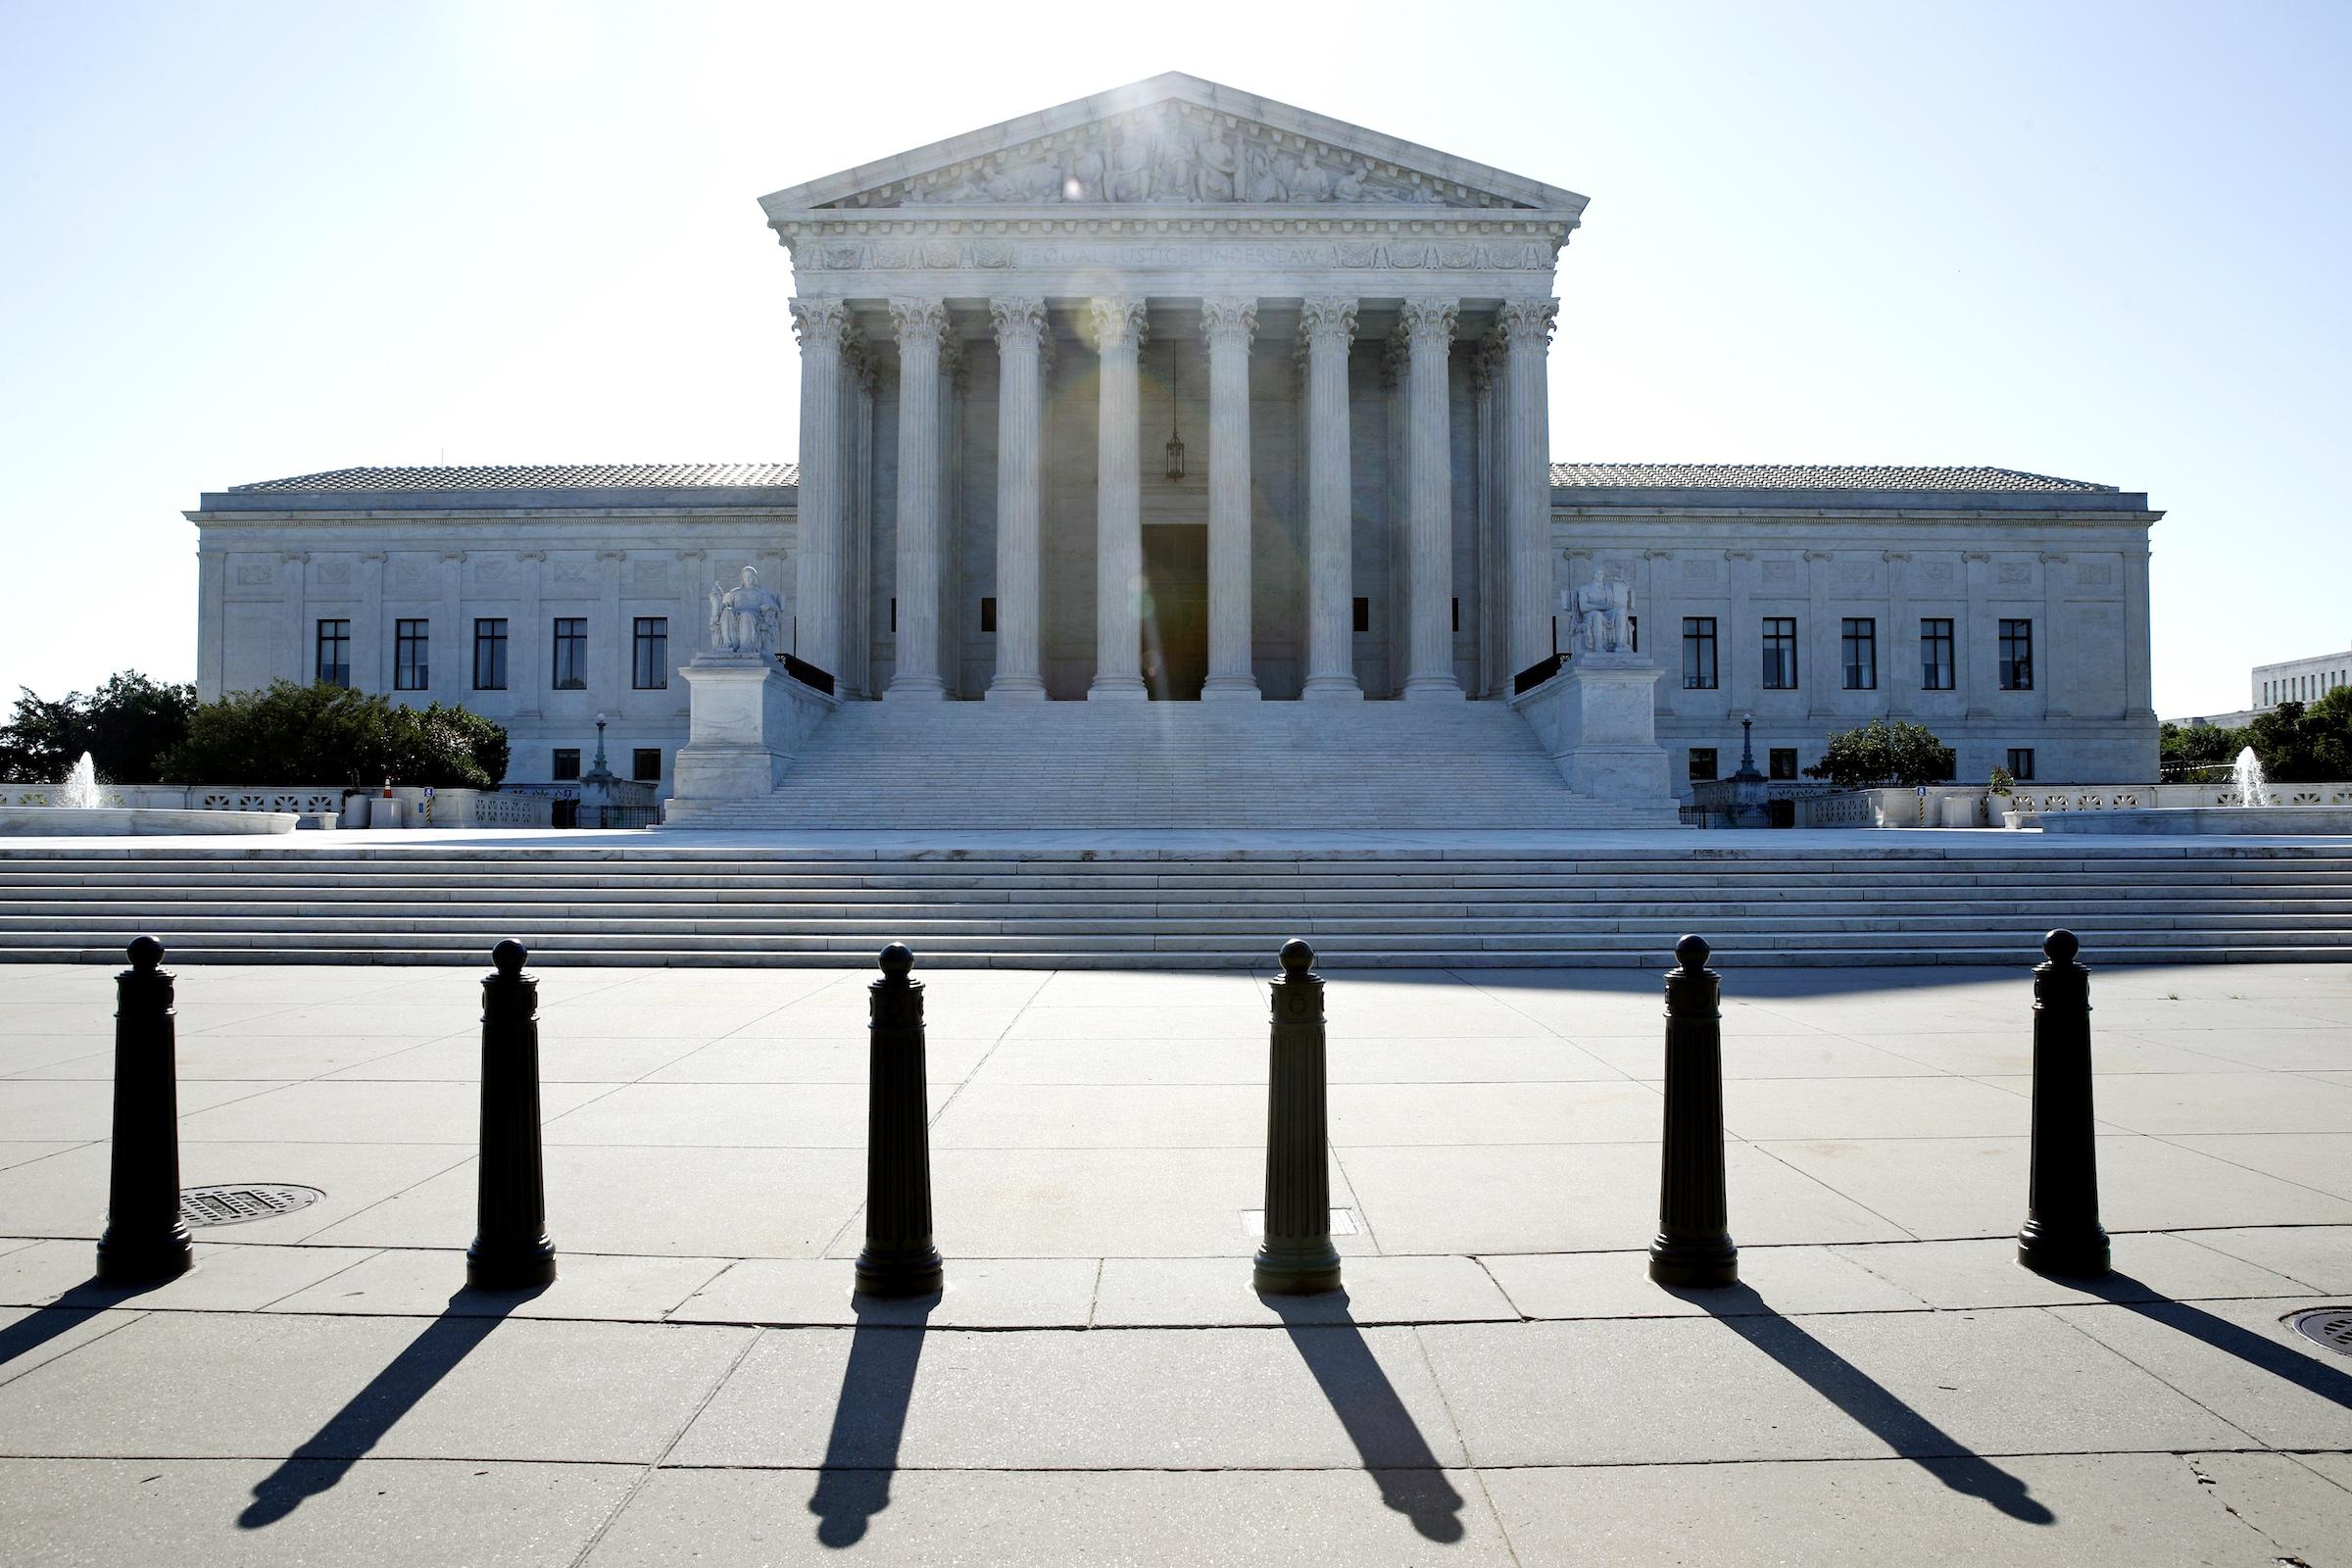 The U.S. Supreme Court in Washington, D.C., on June 29, 2020.